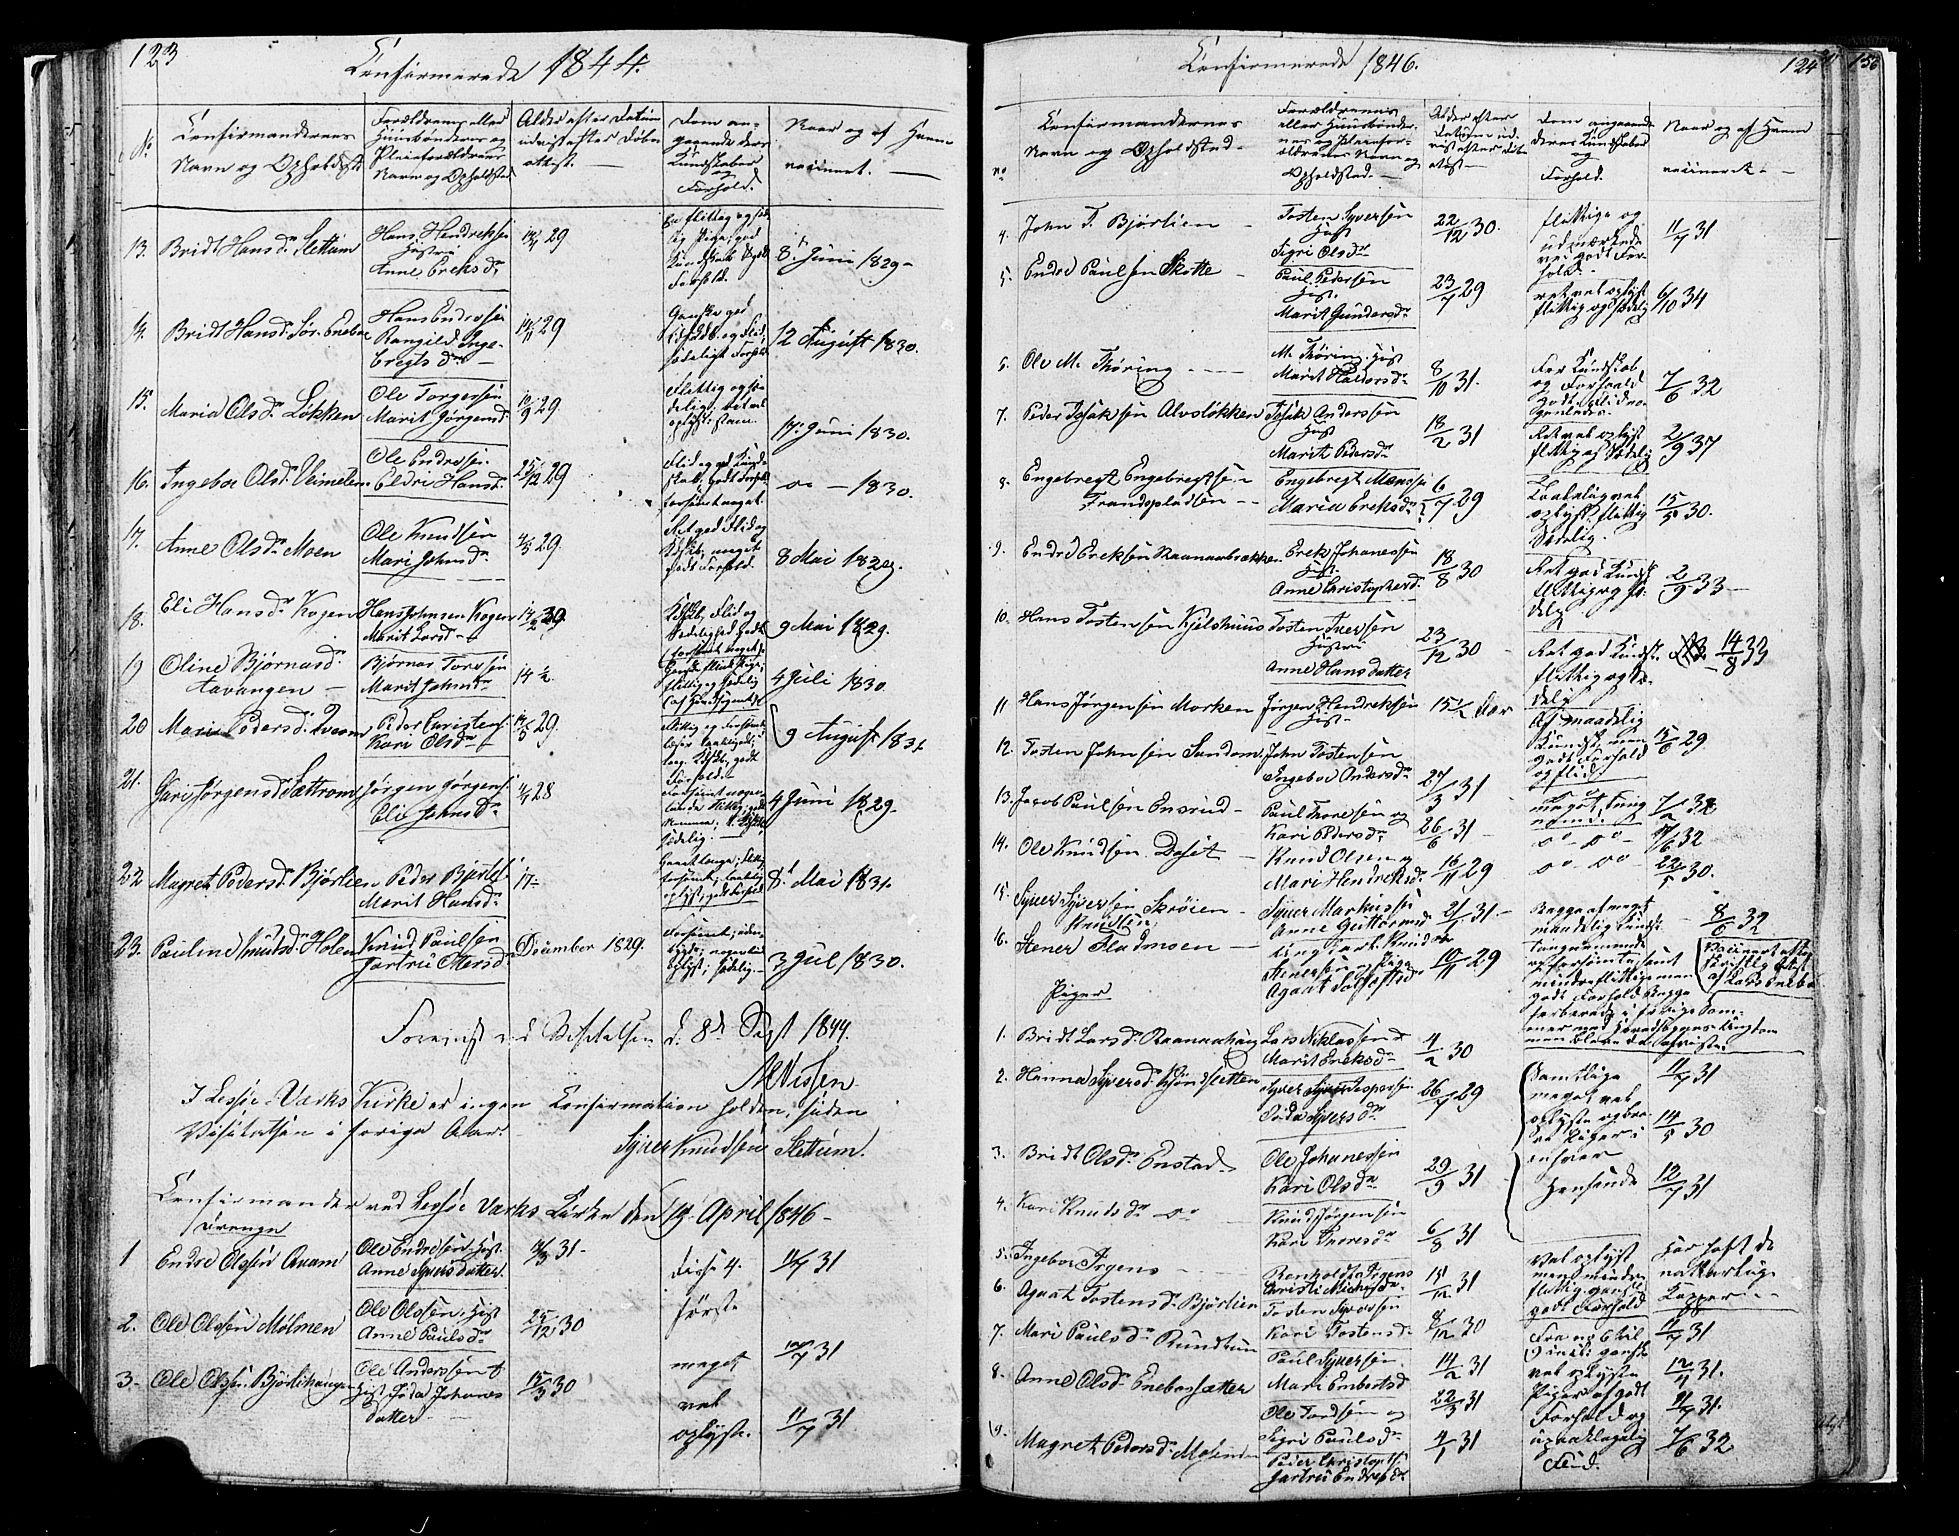 SAH, Lesja prestekontor, Klokkerbok nr. 4, 1842-1871, s. 123-124